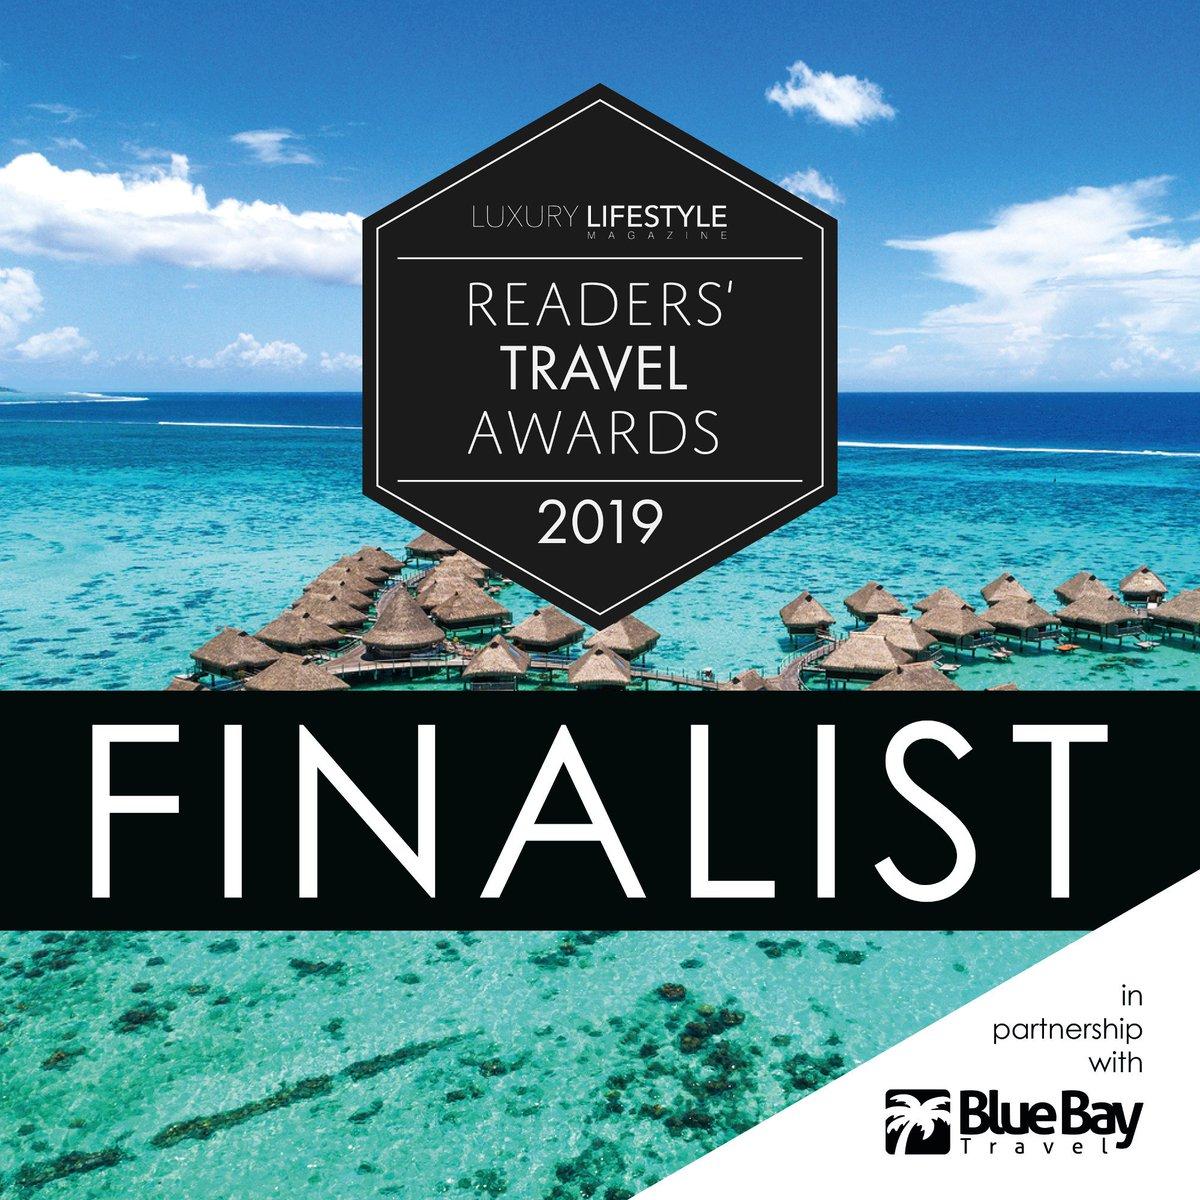 luxury lifestyle il forte village tra i finalisti dei travel awards